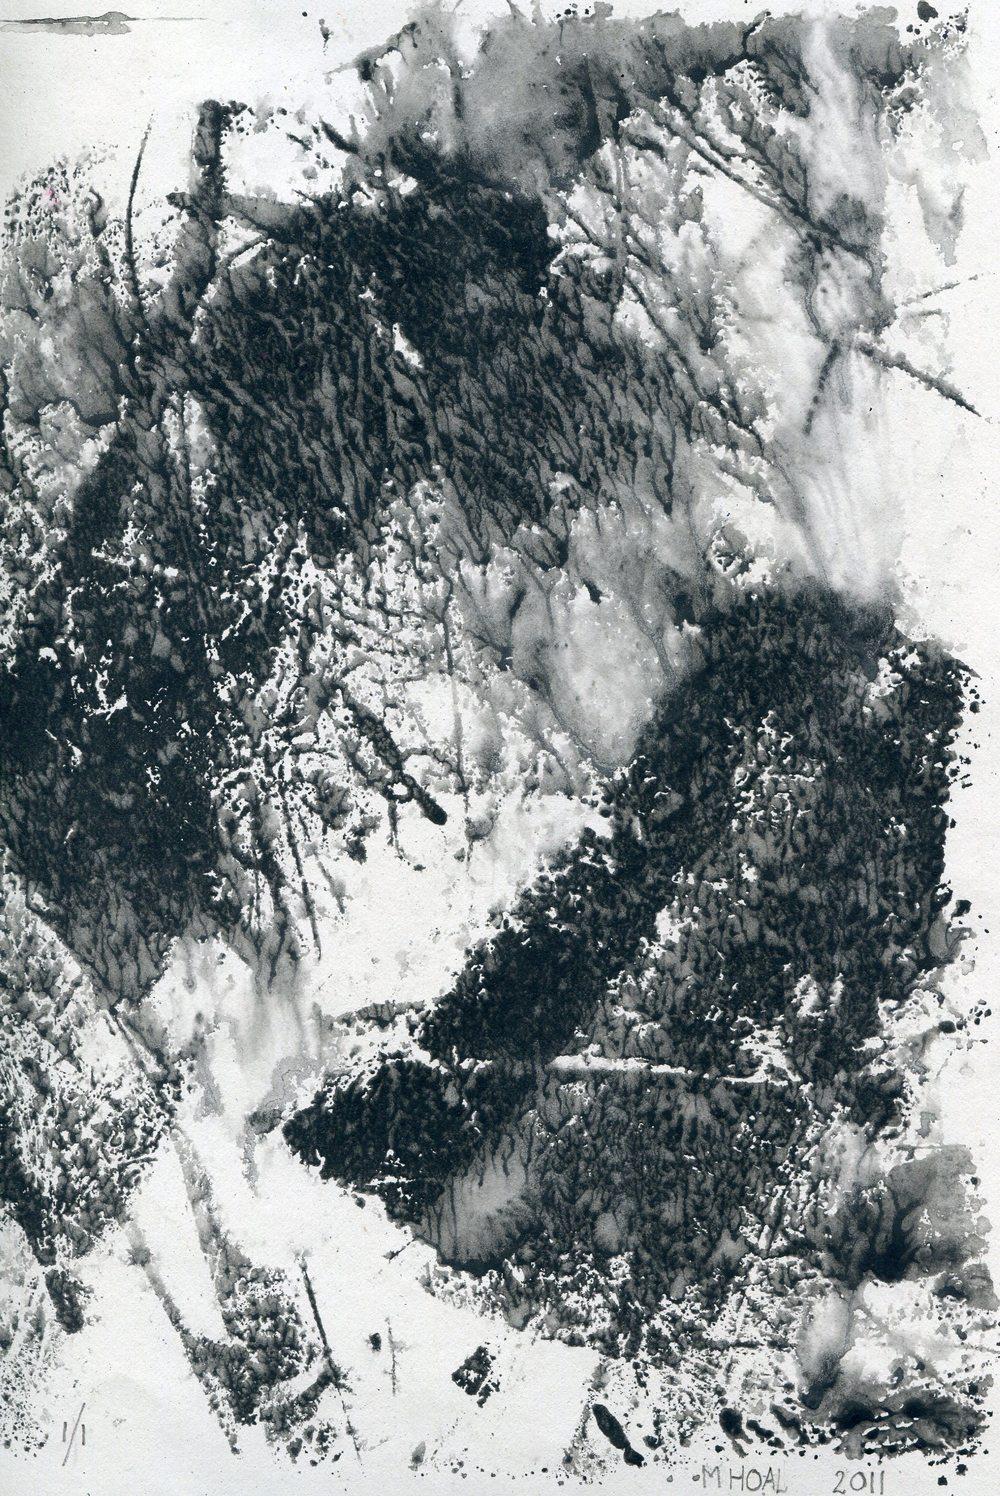 47b Hoal, Margaret- Foliage, Monoprint.jpg